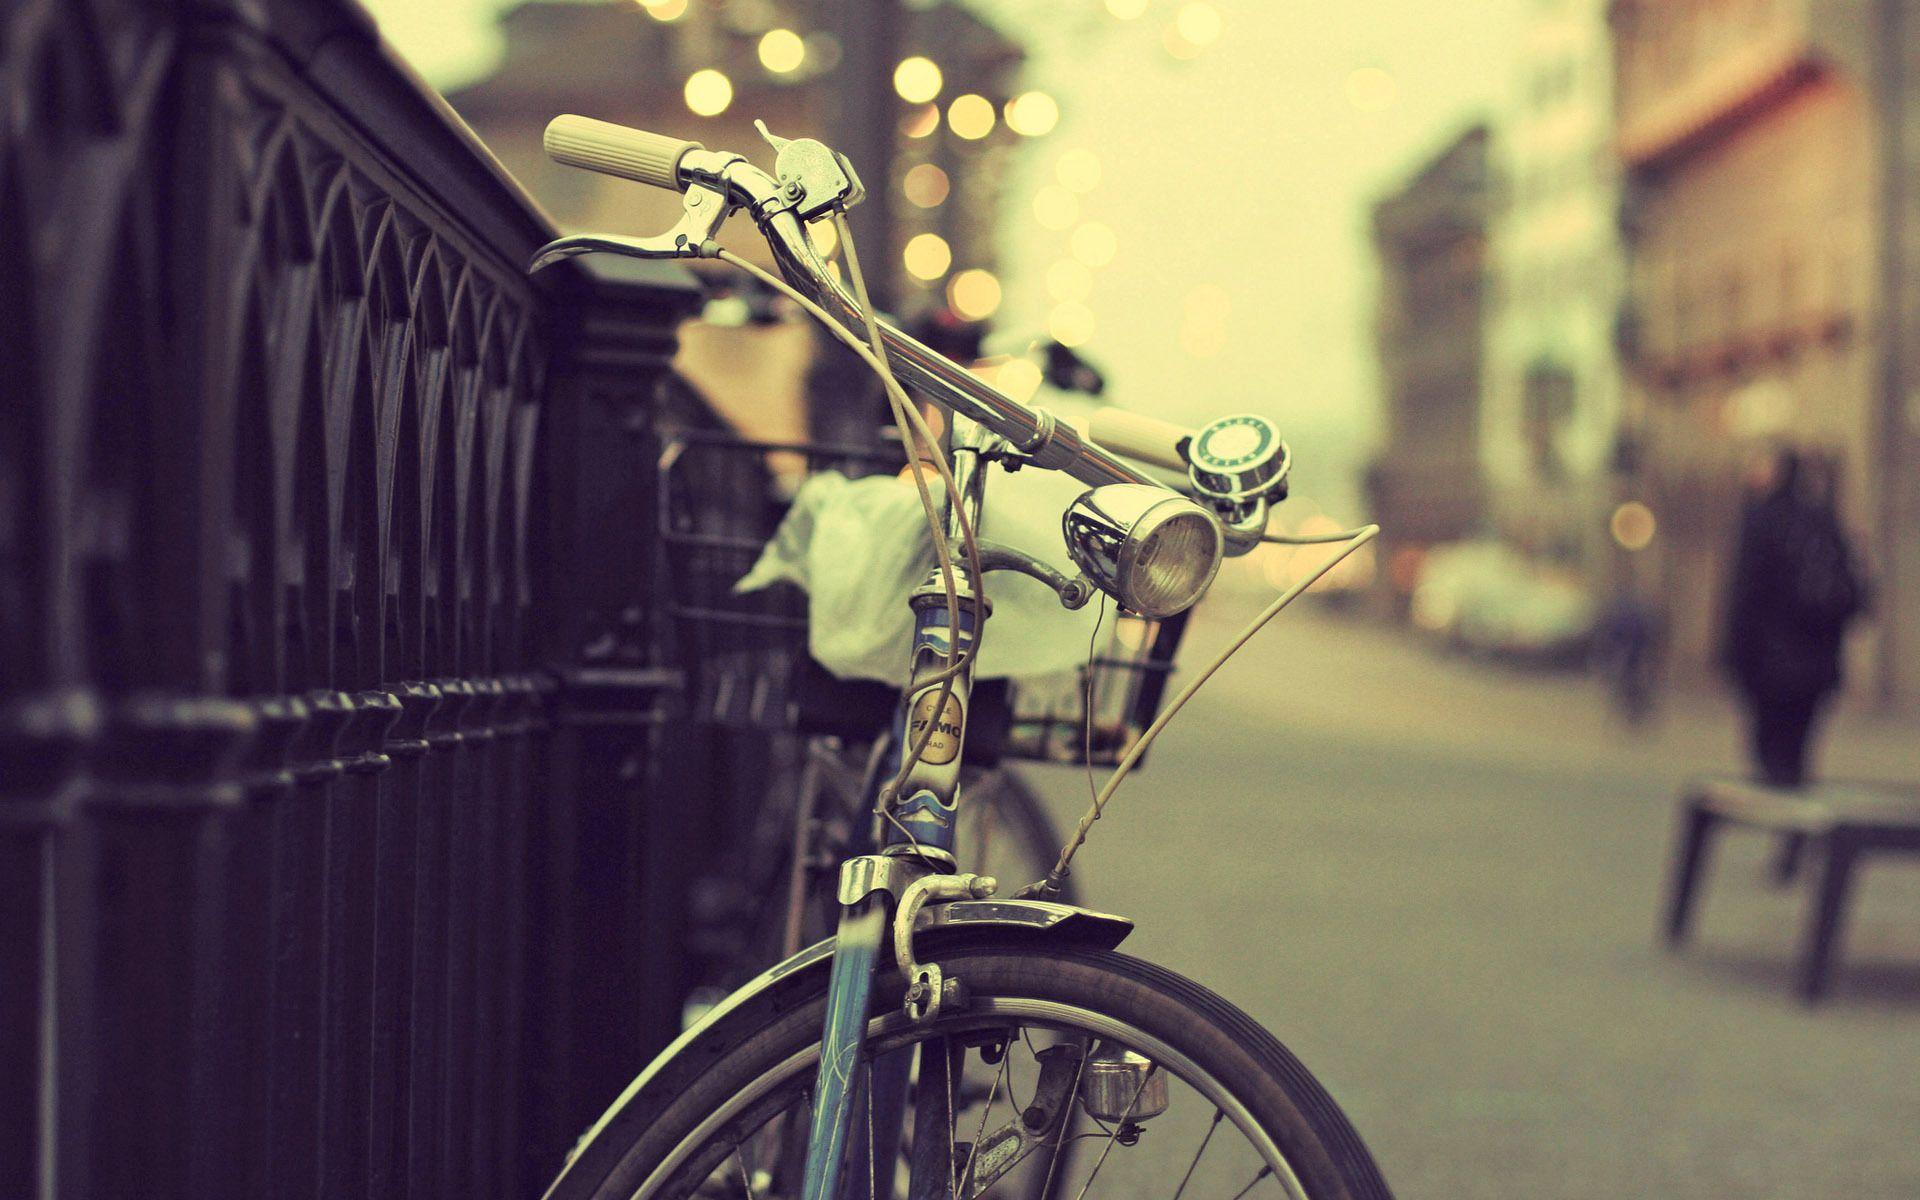 Modern Vintage Photography Tumblr Wallpapers Hd Bike Photography